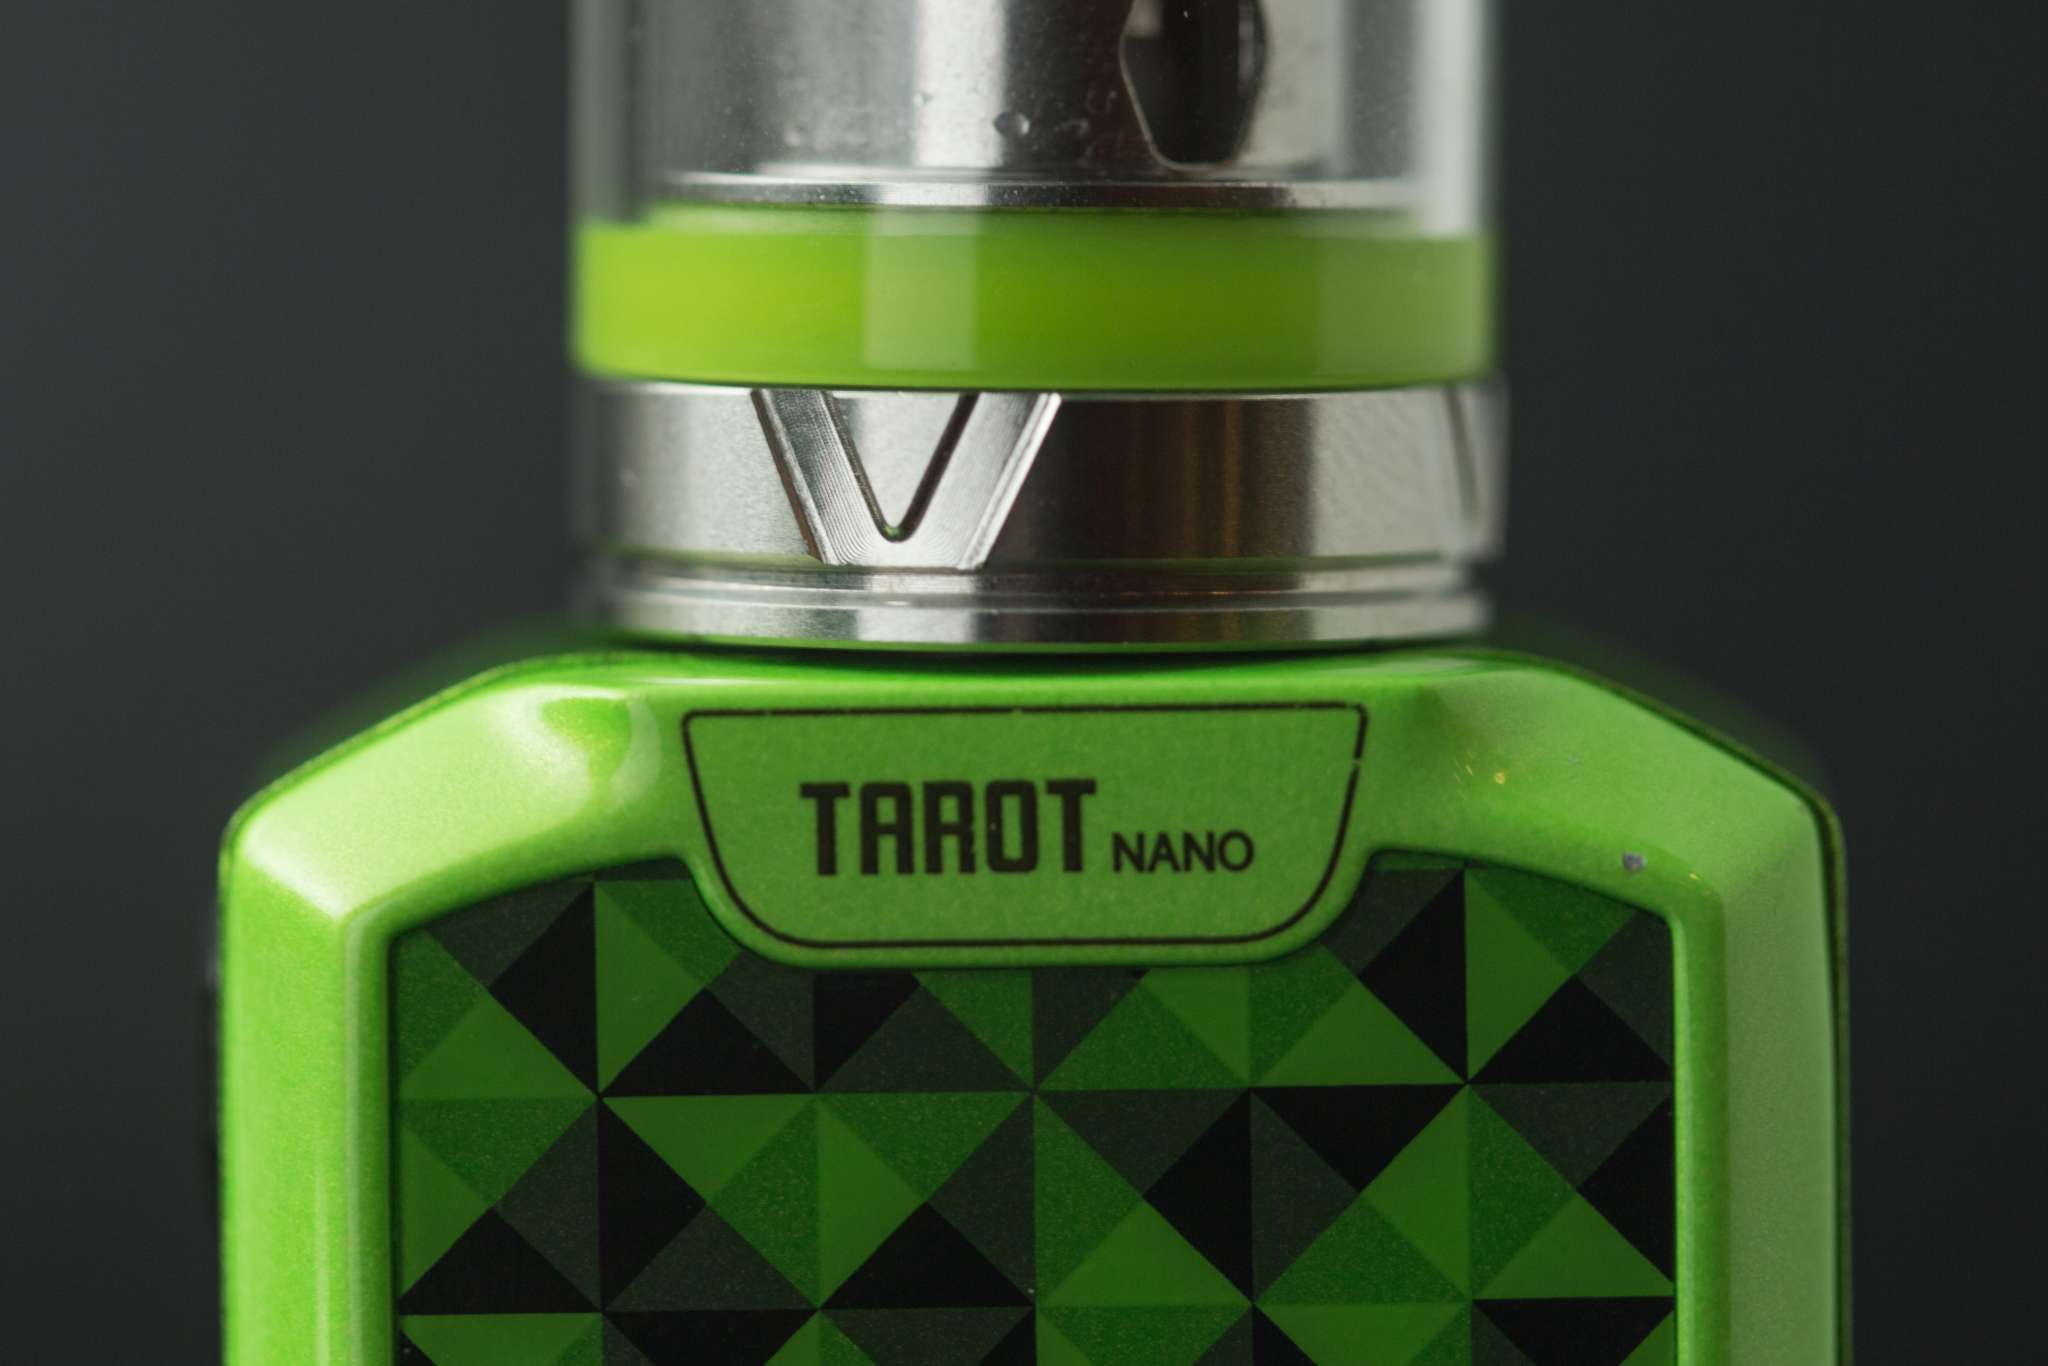 Vaporesso Tarot nano